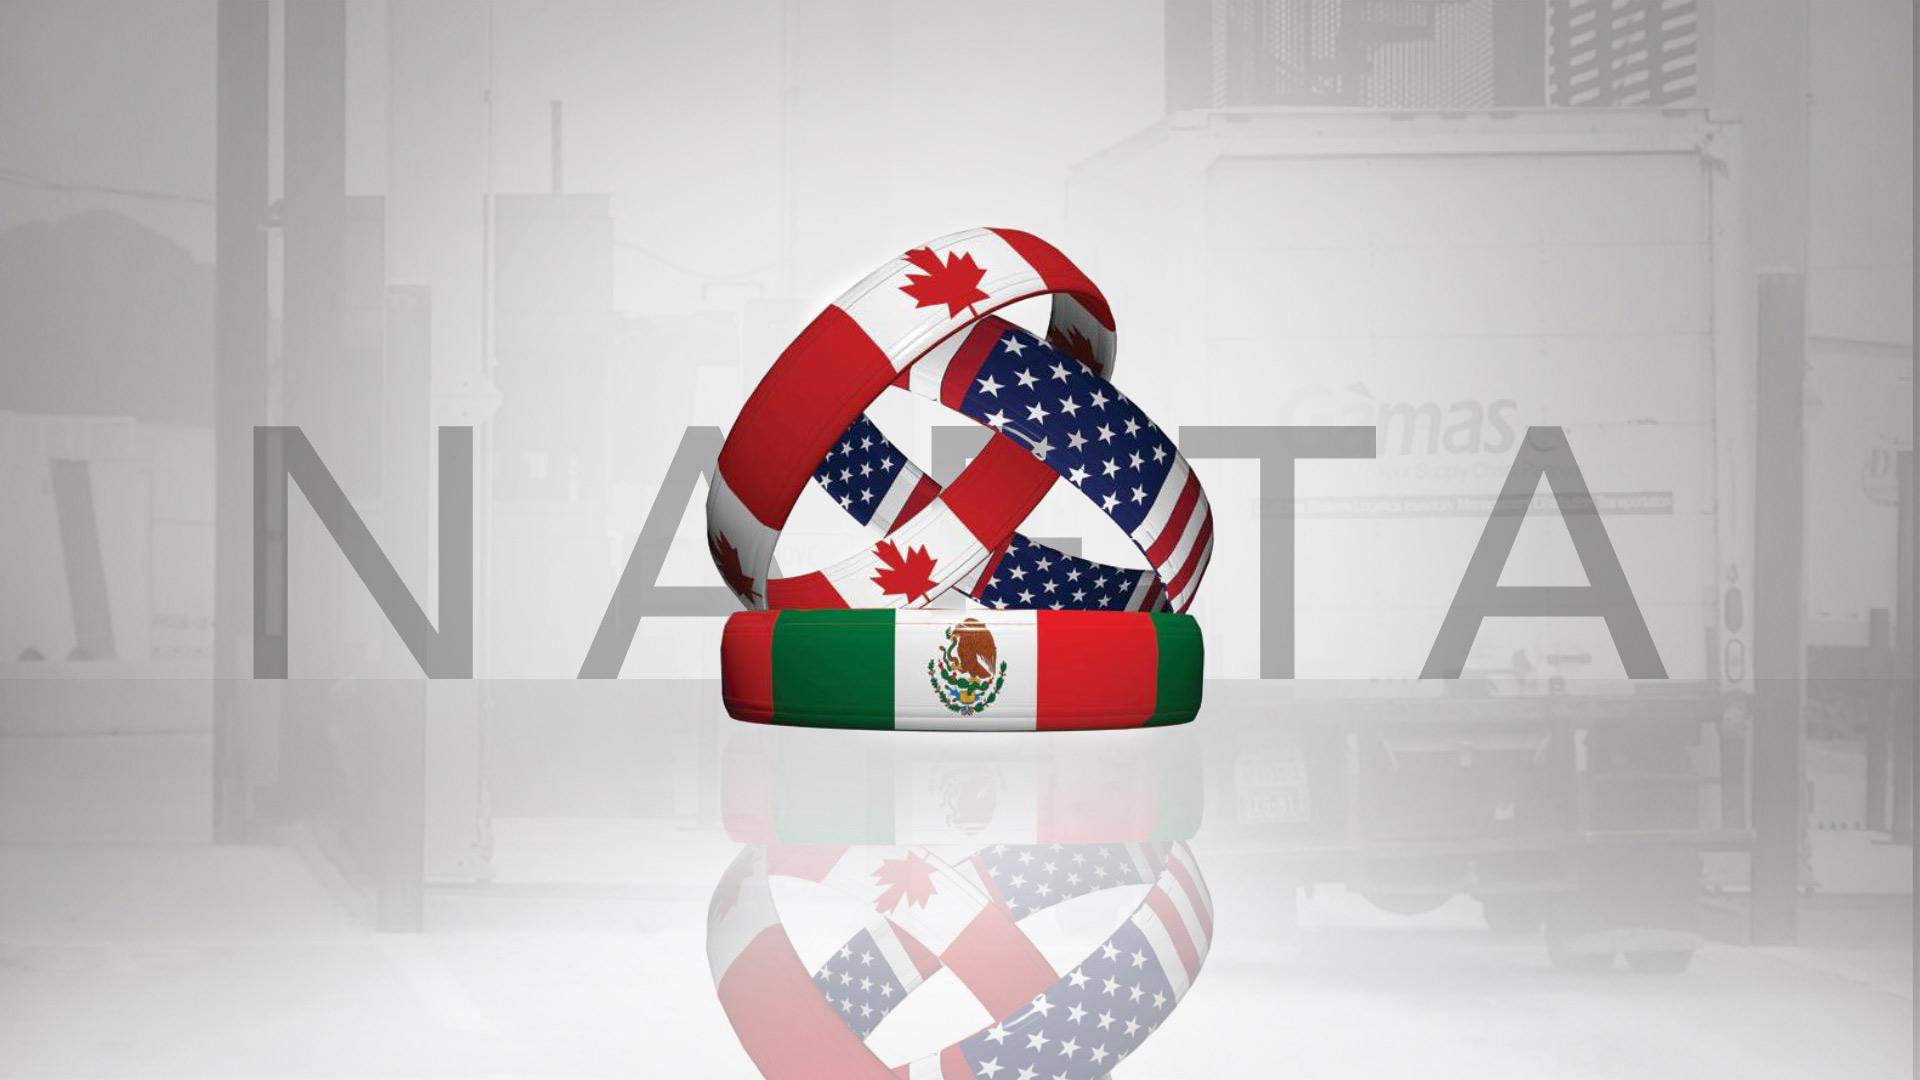 NAFTA Graphic